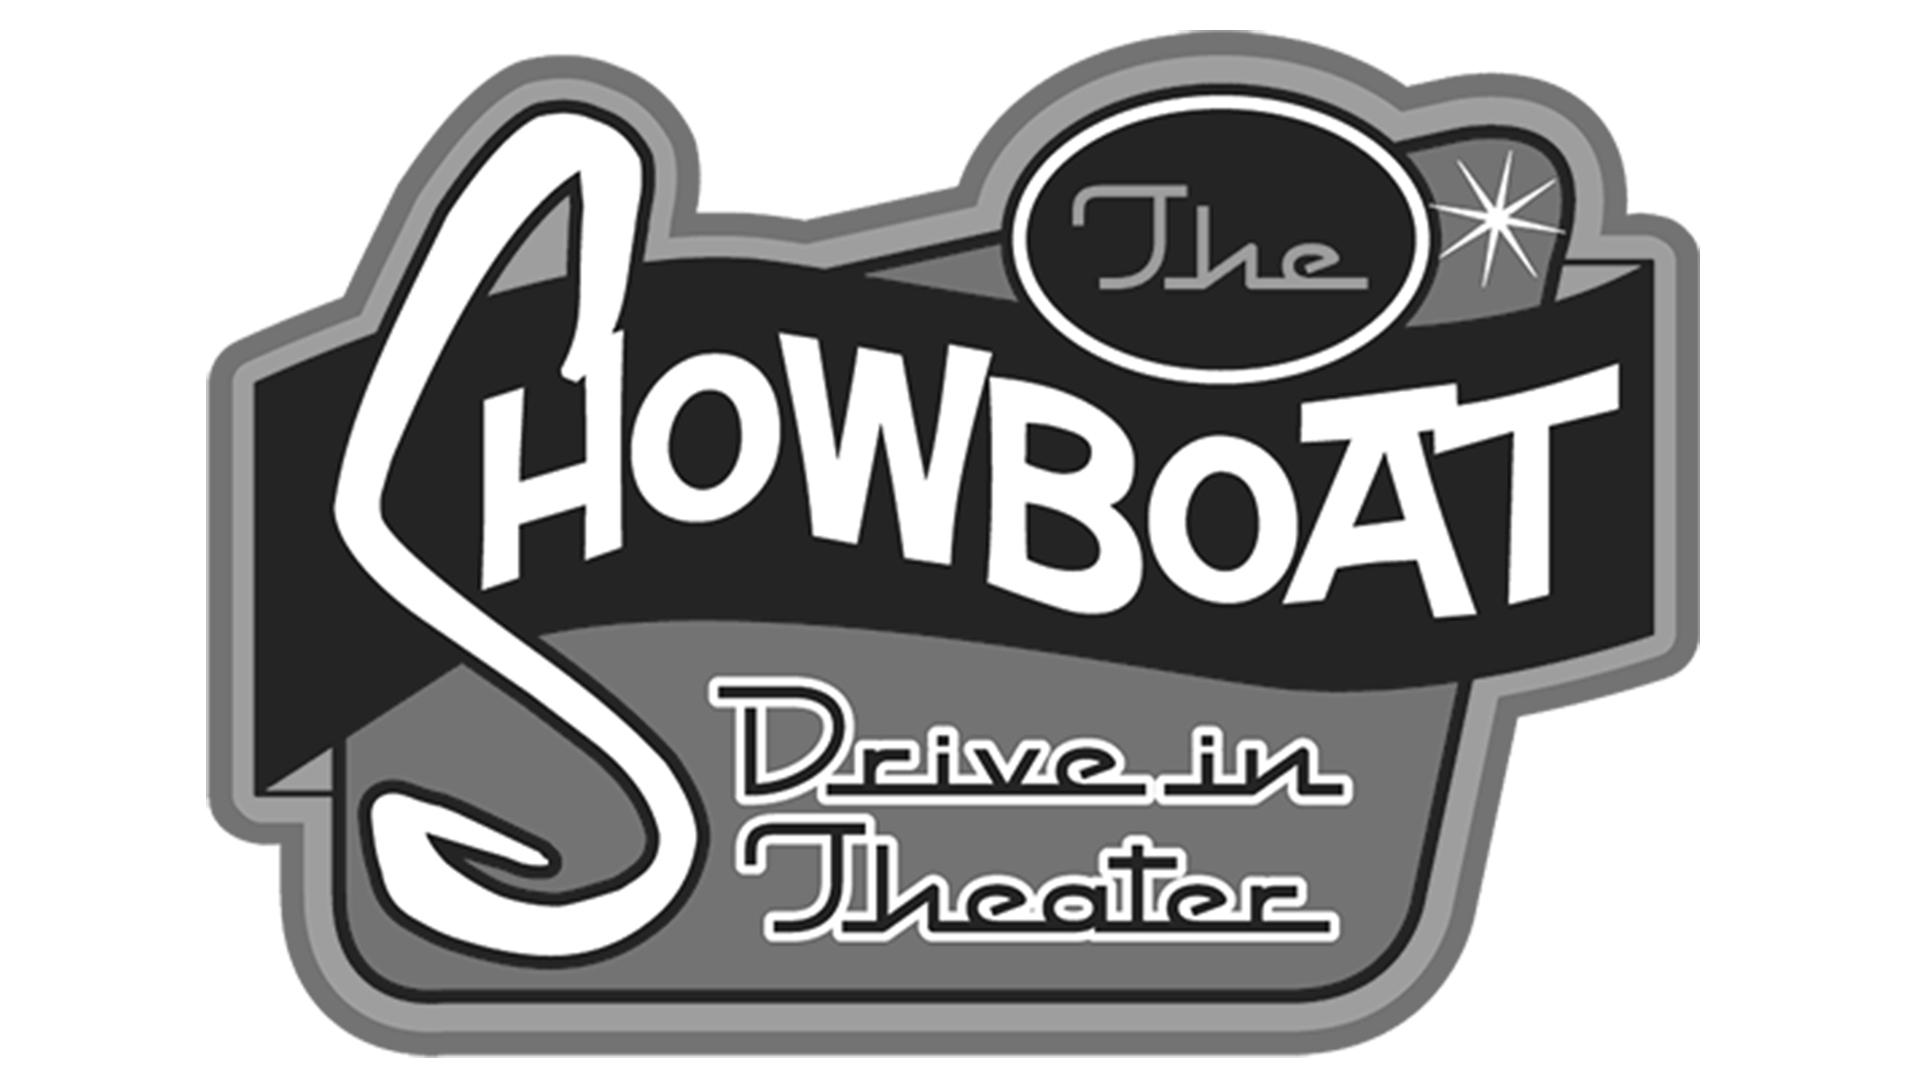 Showboat_Venue_1920x1080